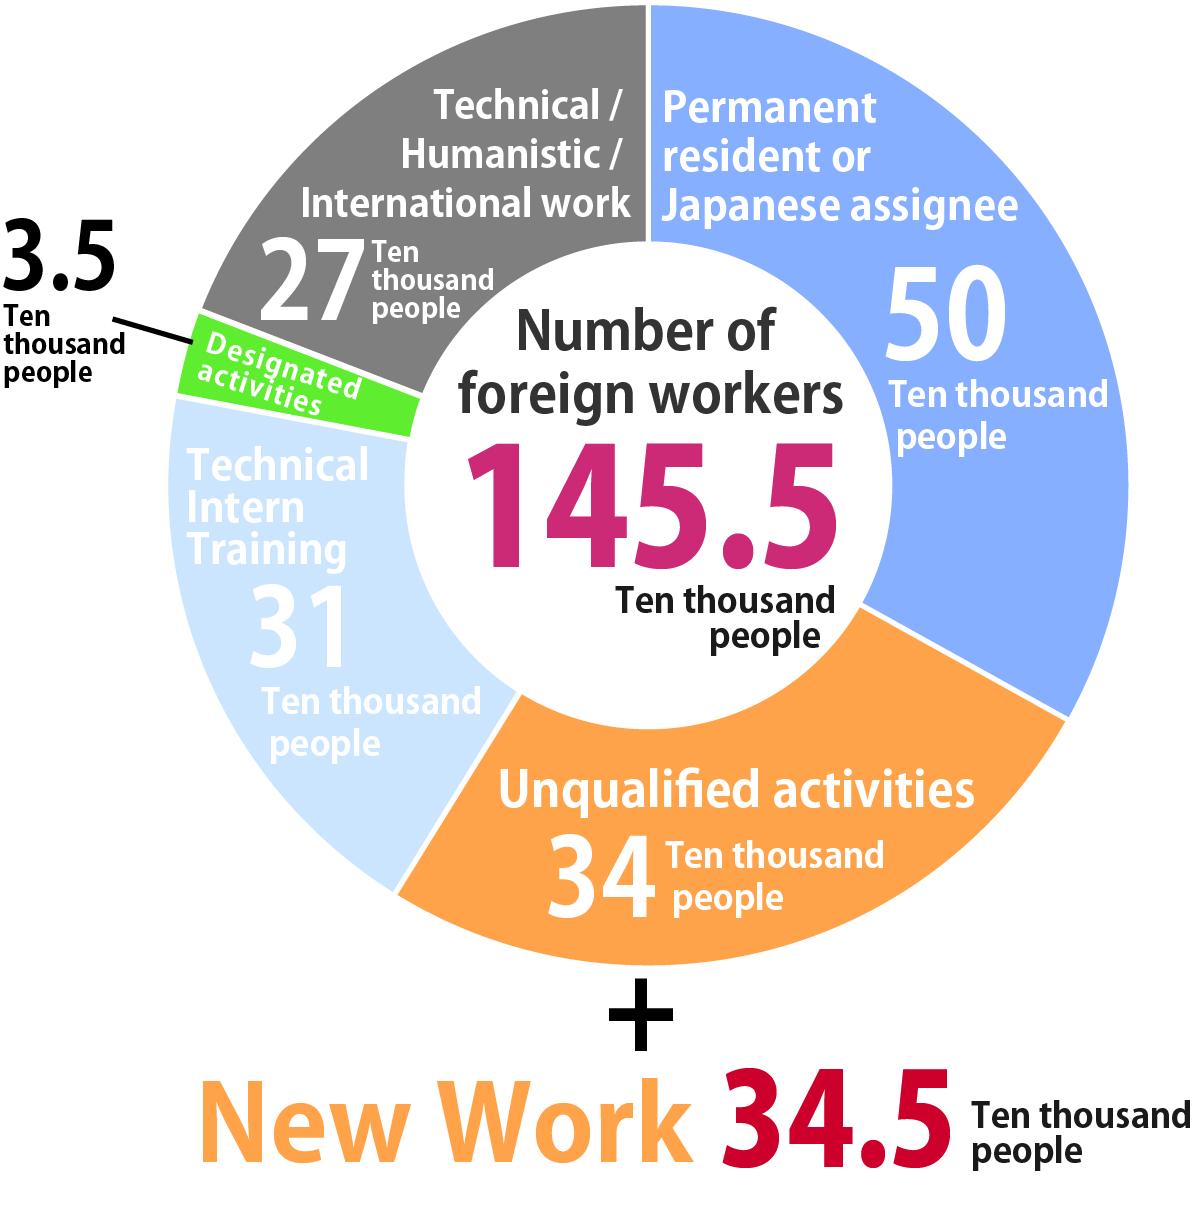 New work 34.5 ten thousand people